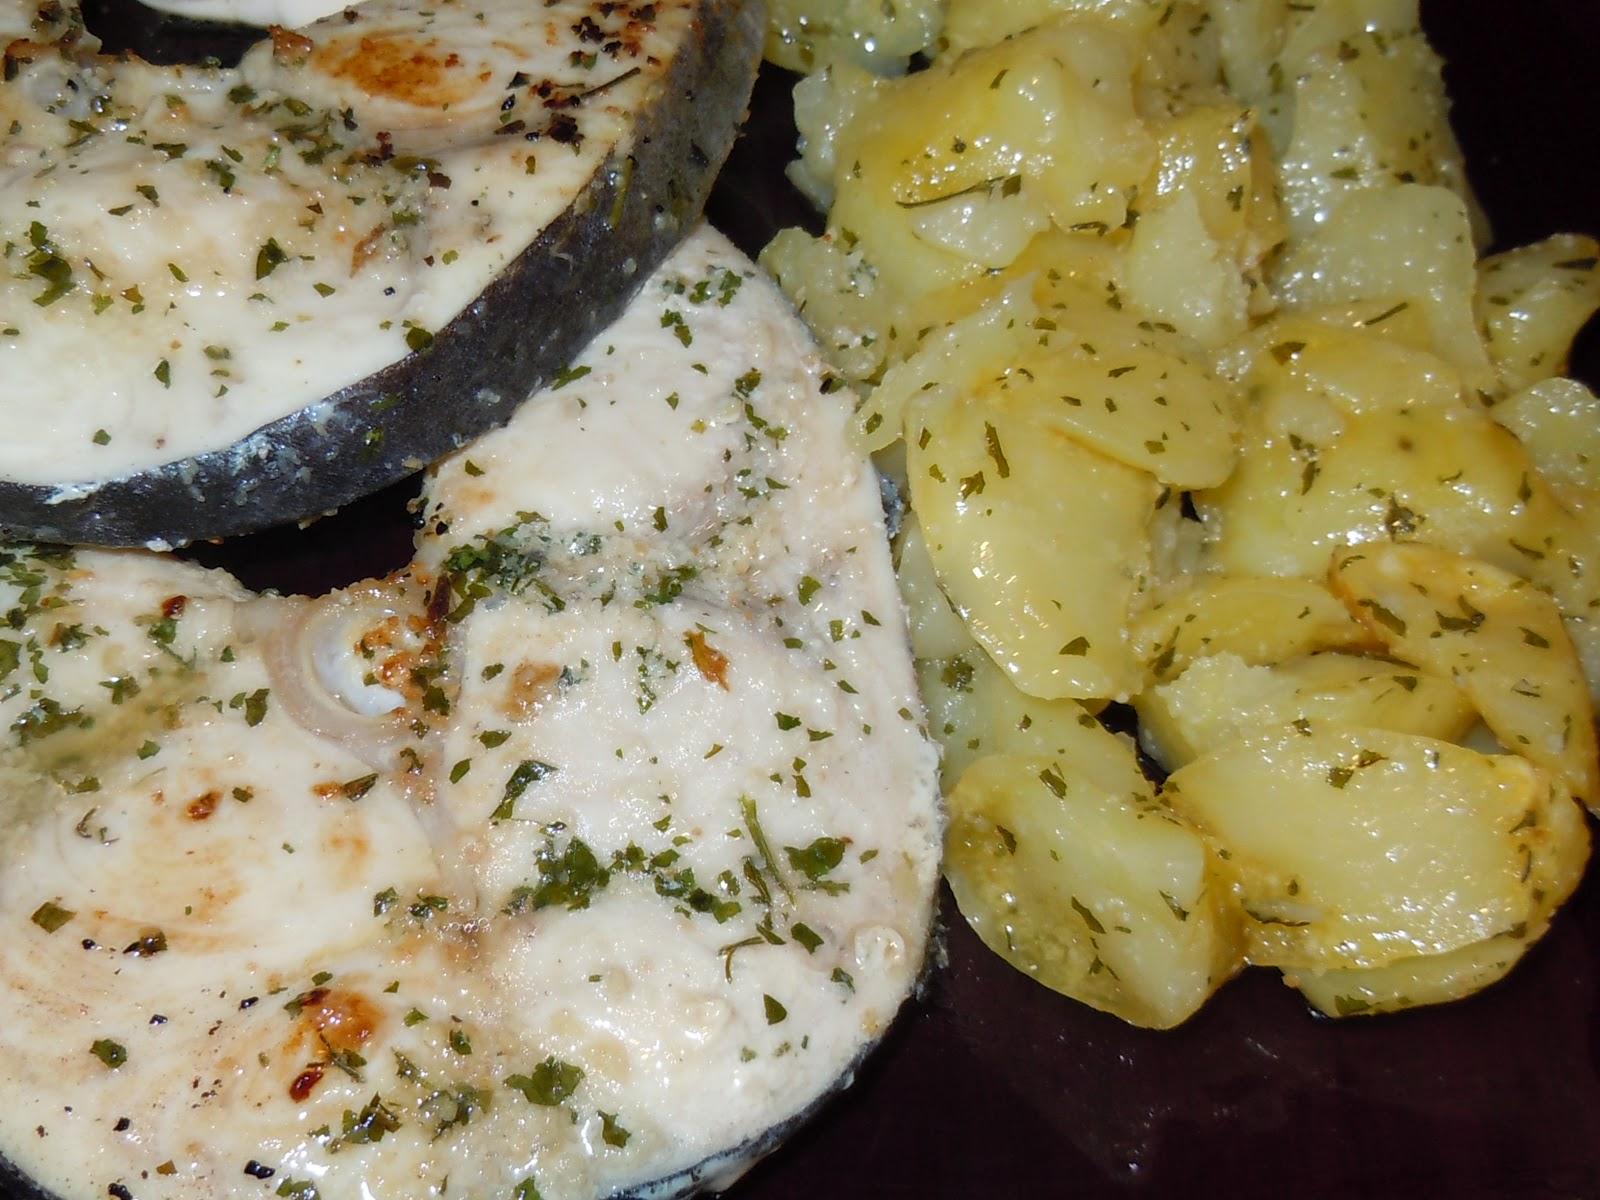 El blog de debora mis recetas del dia a dia pez espada a for Cocinar pez espada a la plancha